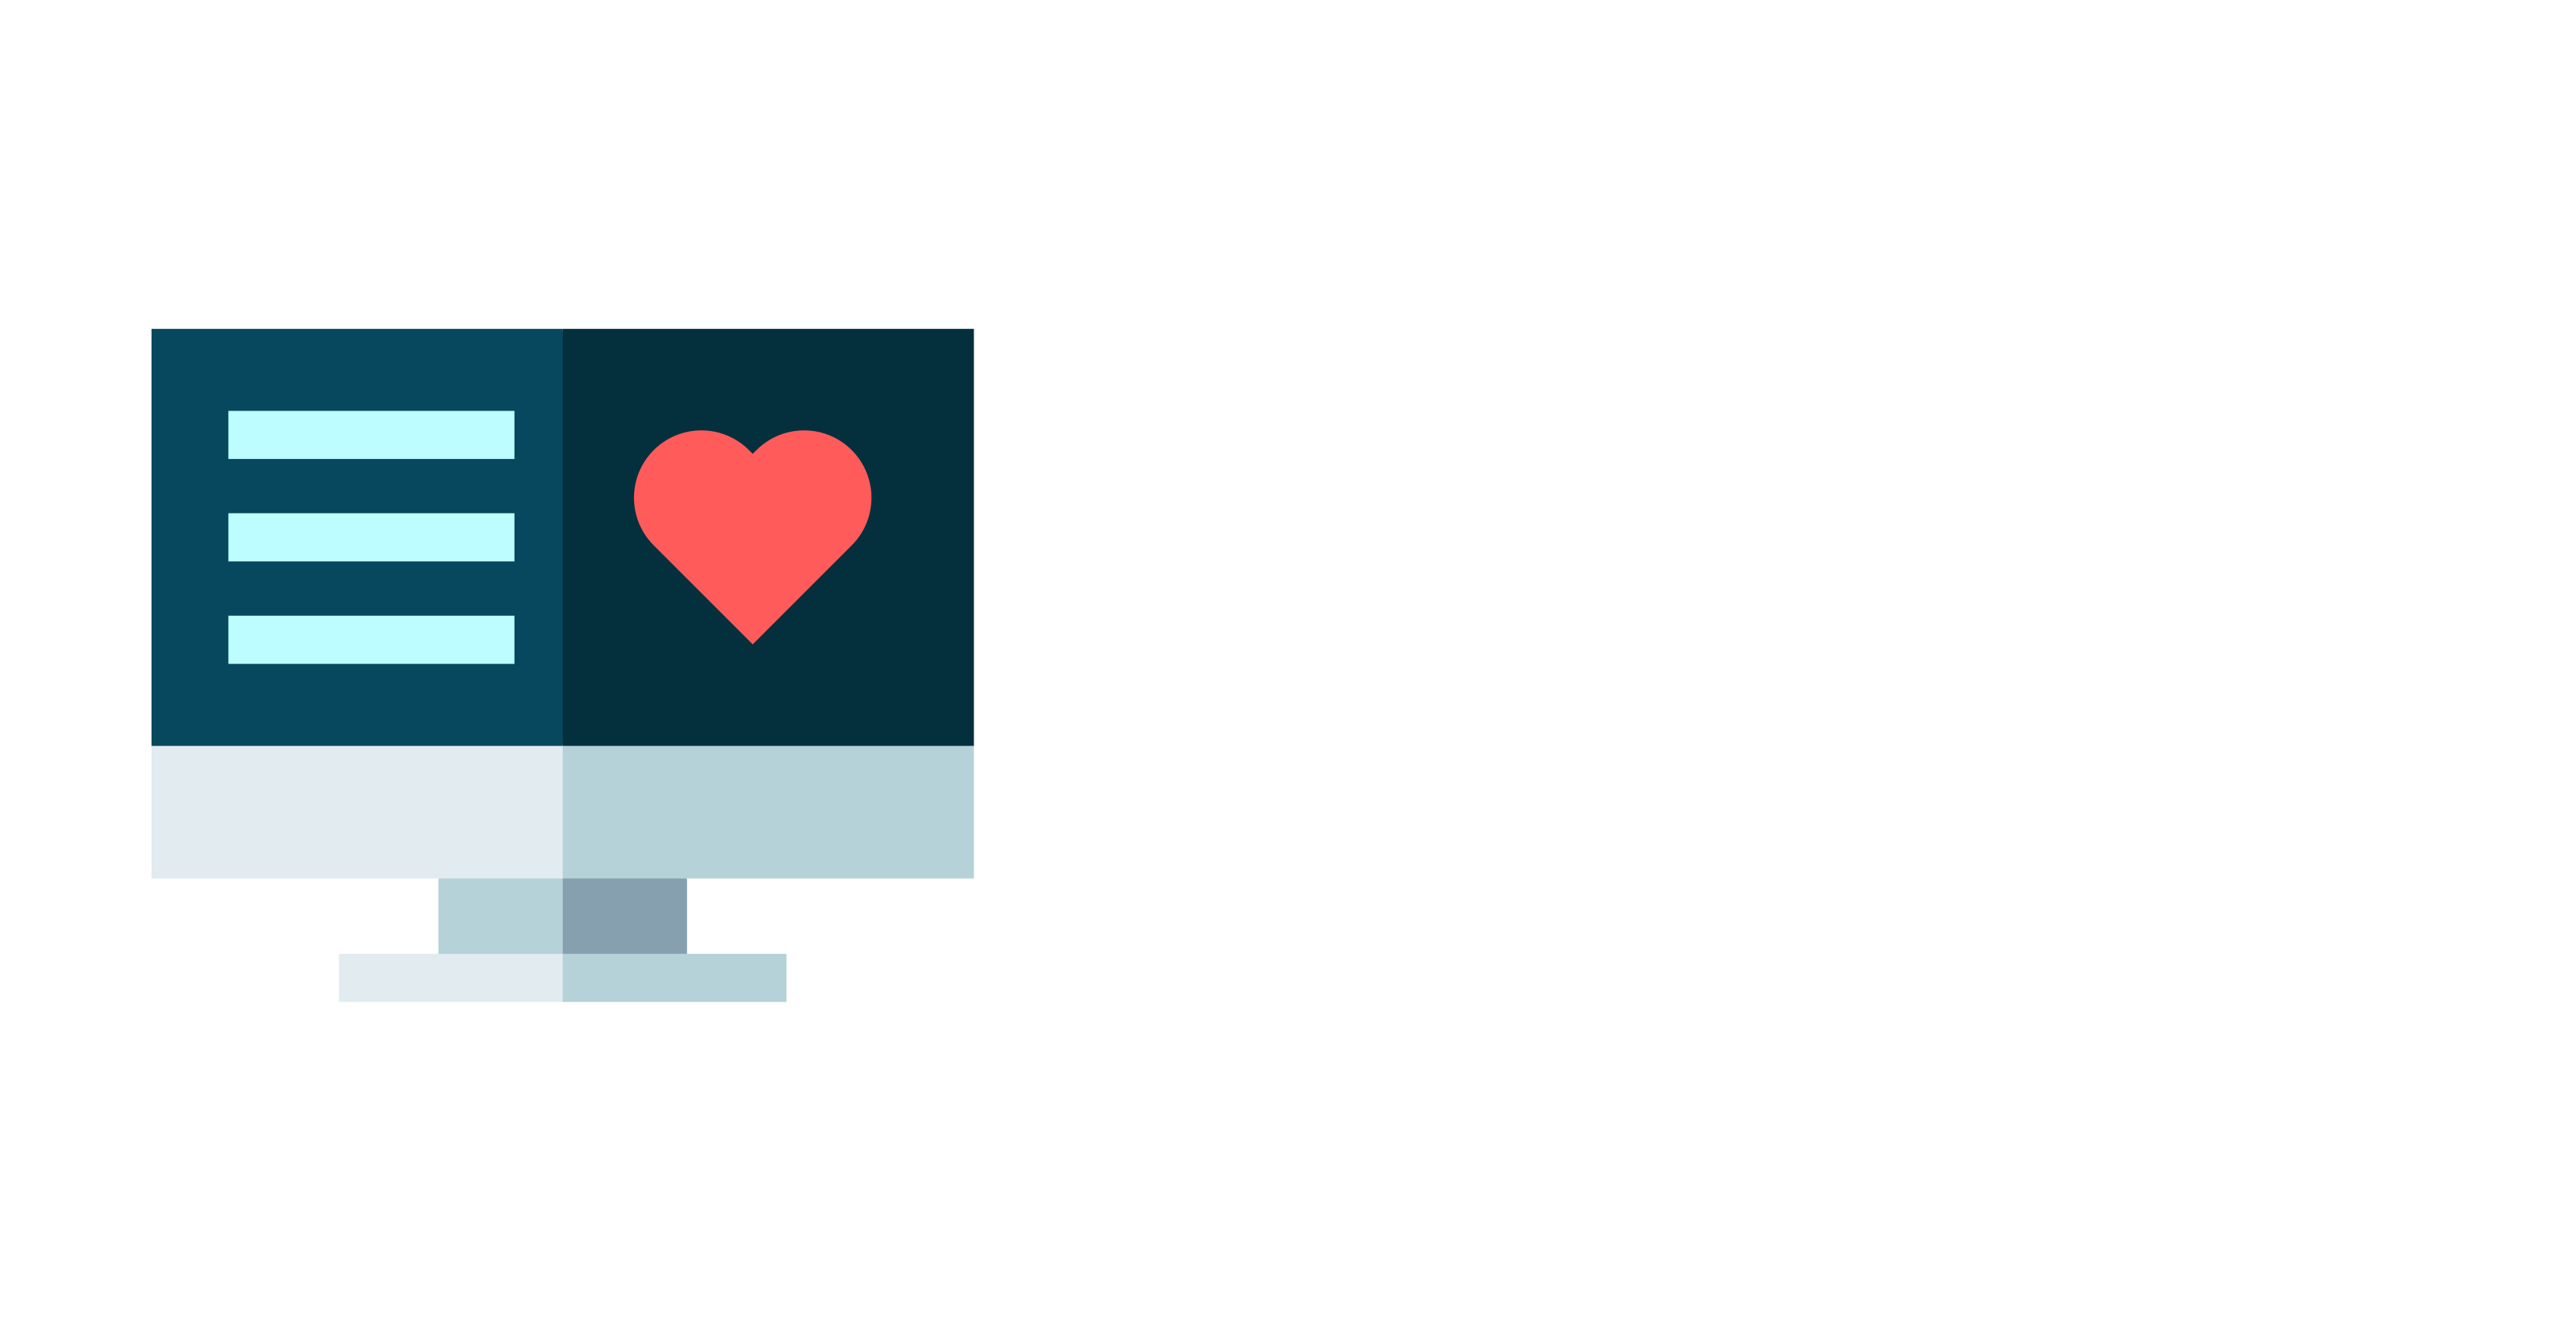 Devs Do Good logo next to organization title